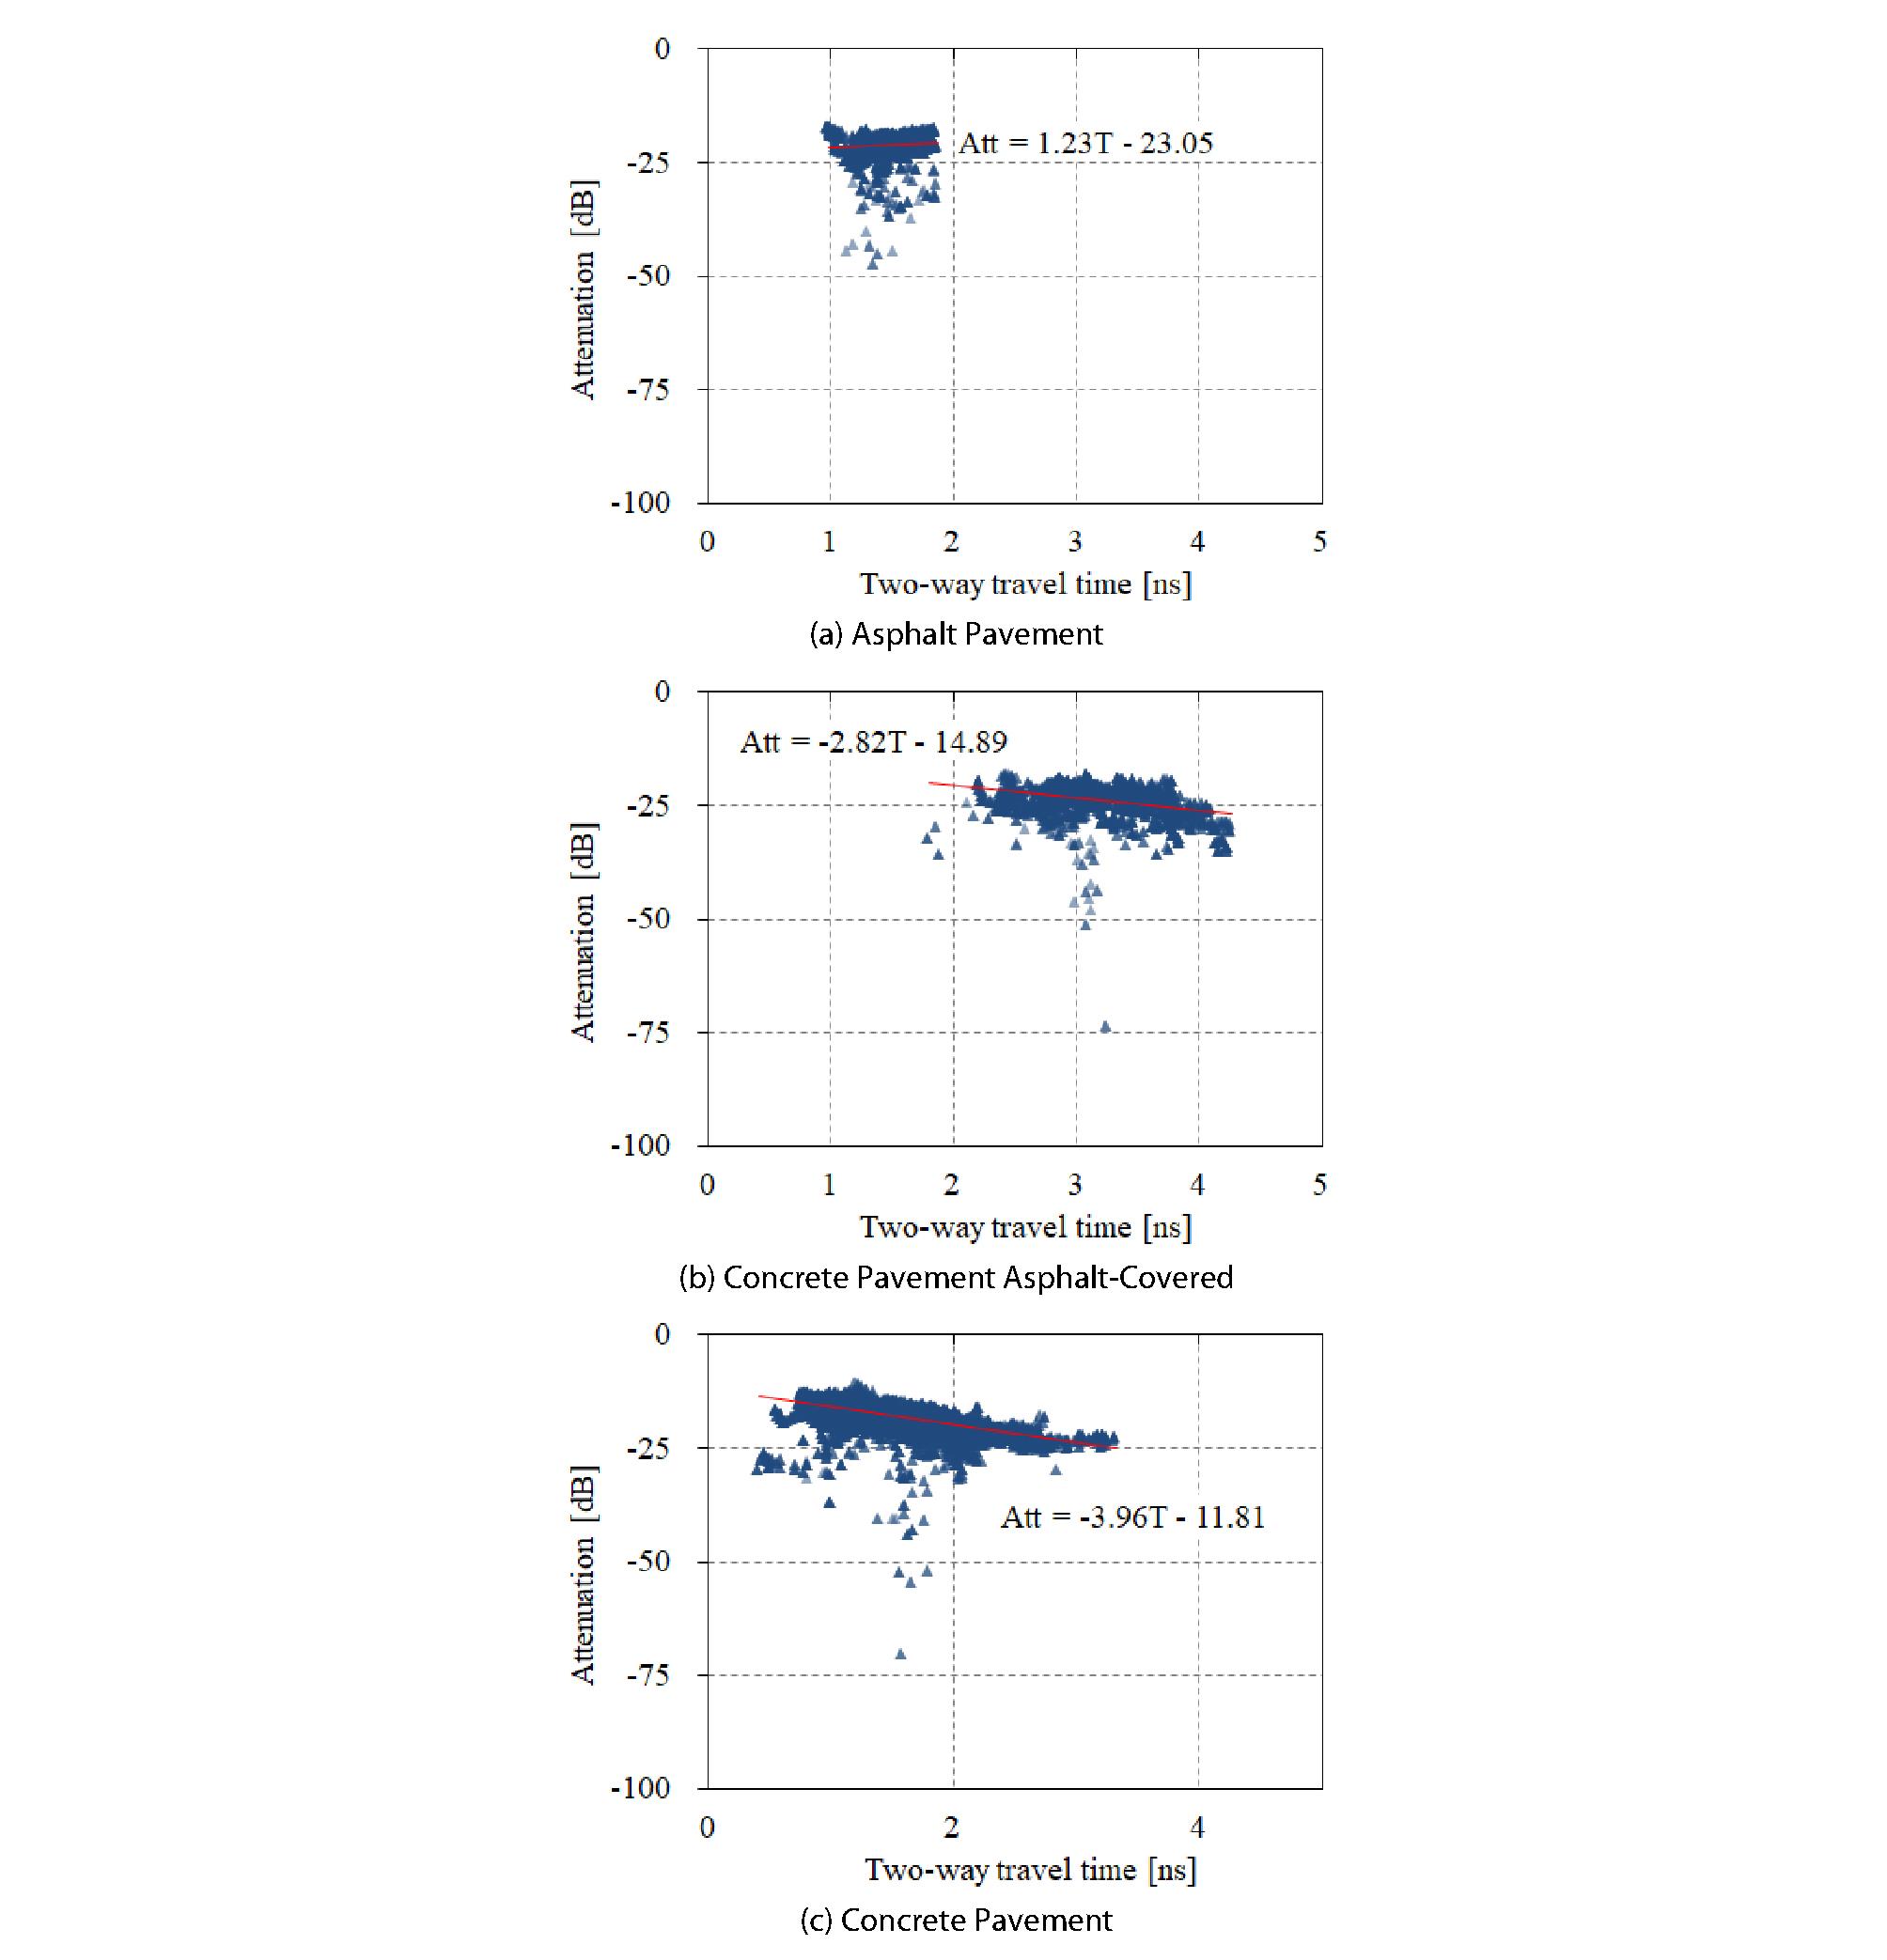 http://static.apub.kr/journalsite/sites/ksce/2020-040-03/N0110400303/images/Figure_KSCE_40_03_03_F7.jpg